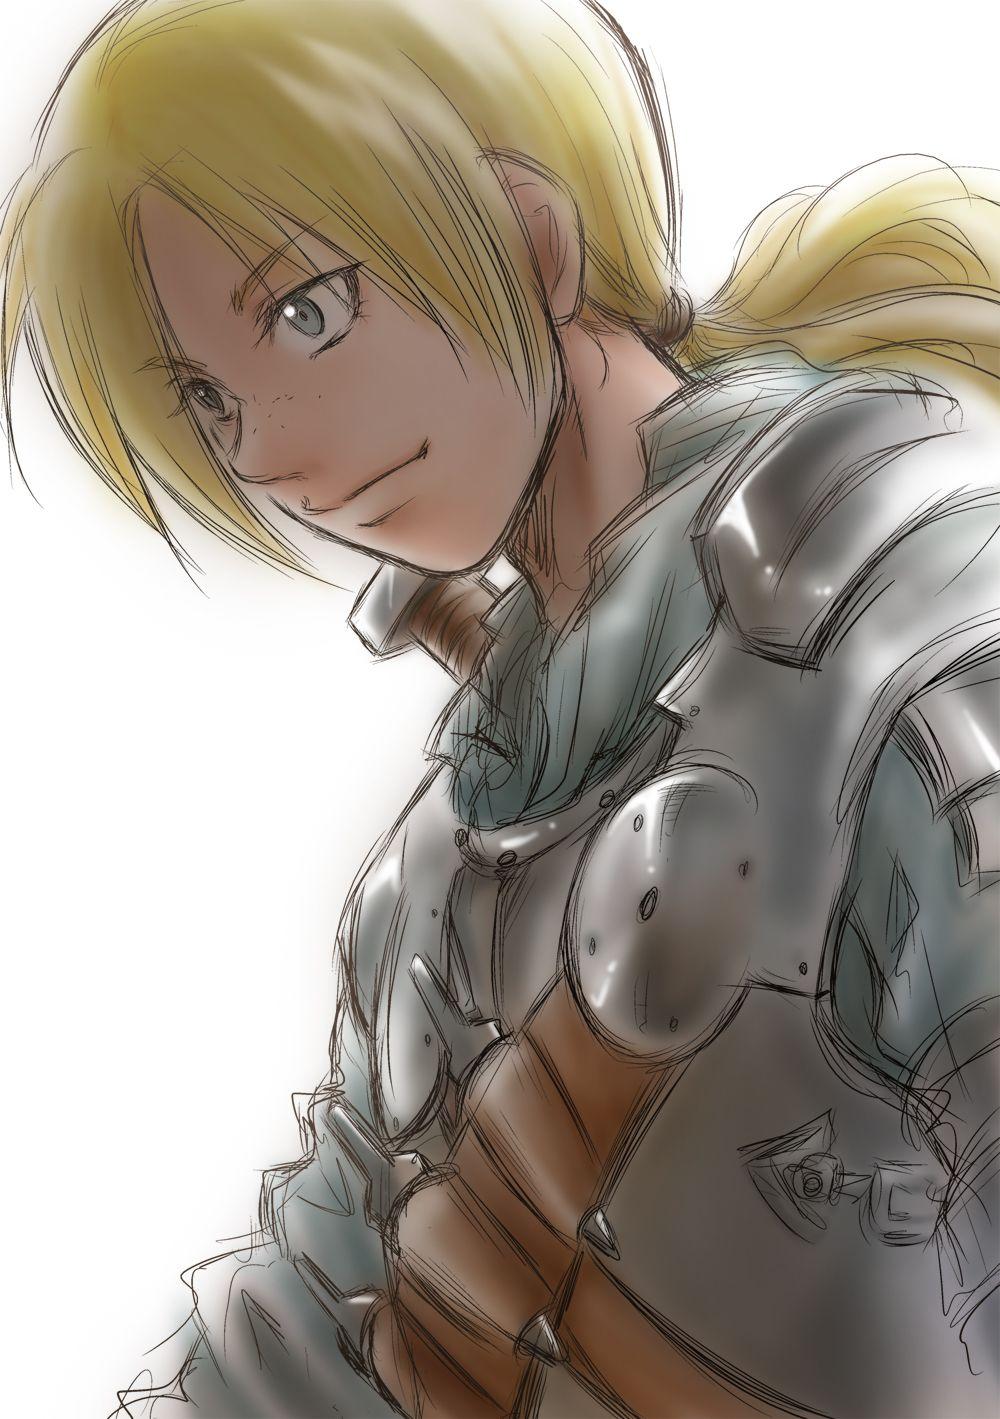 Anime Characters Like Guts : 「器用だけど、不器用で。」 「ちゅーたろー」のイラスト pixiv berserk shounen